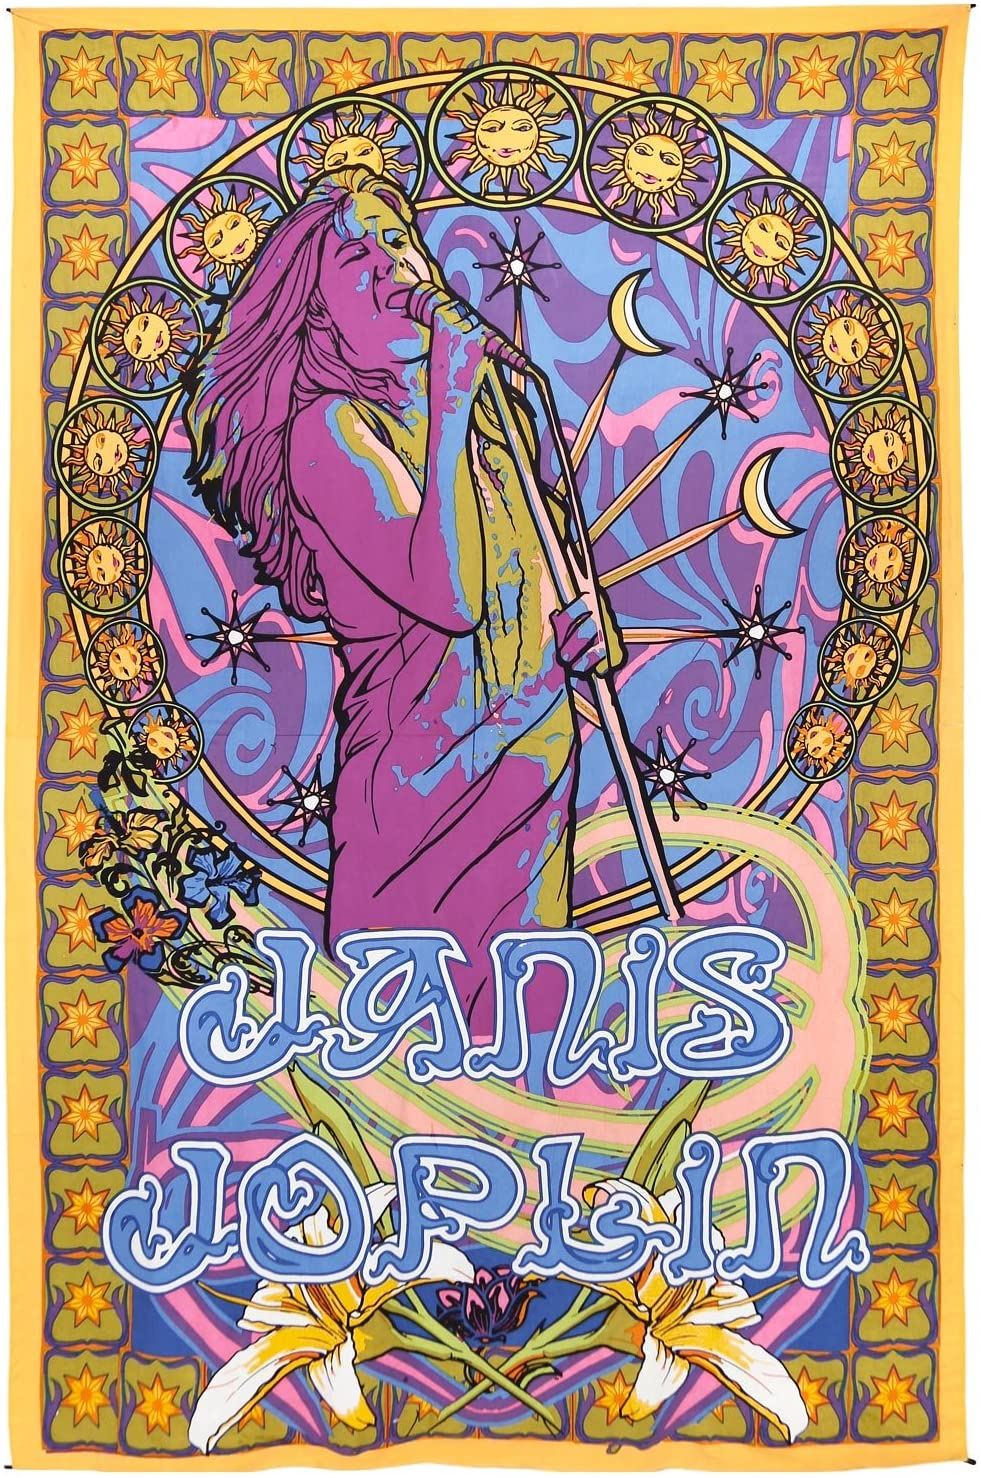 Sunshine Joy Janis Joplin Tapestry Hippie Wall Art Huge 60x90 Inches